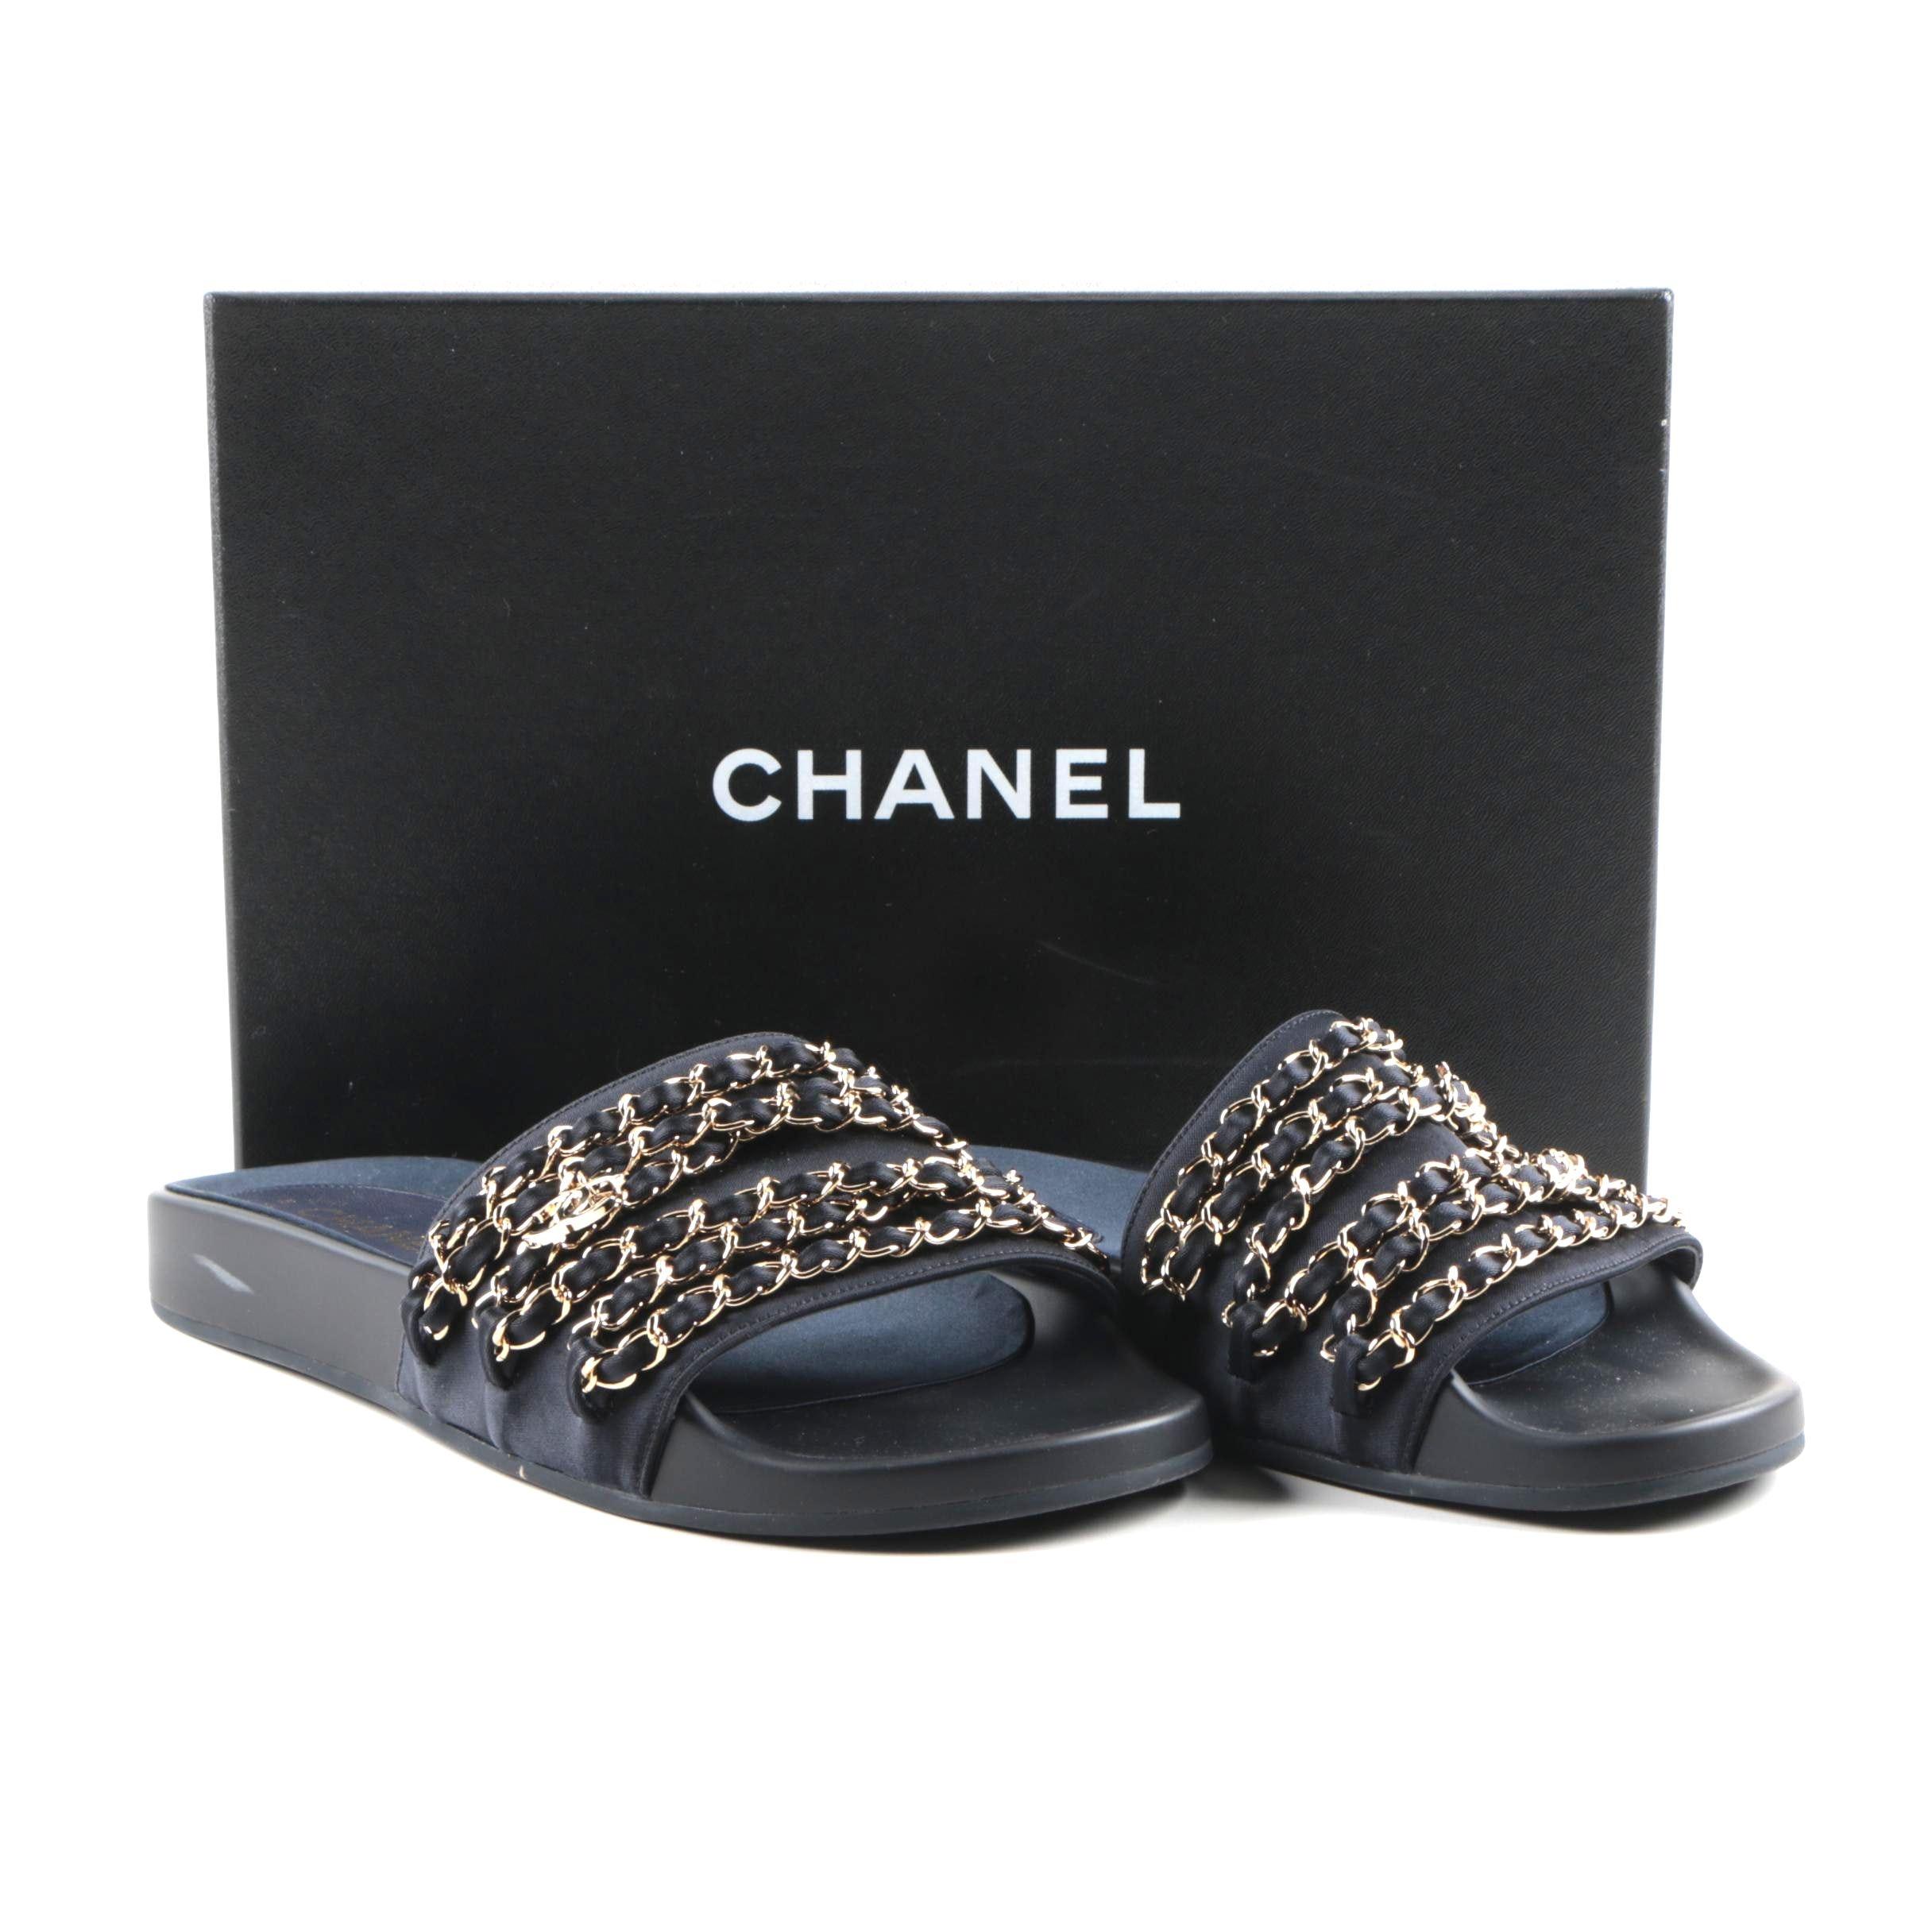 Women's Chanel Marine Blue Slide Sandals